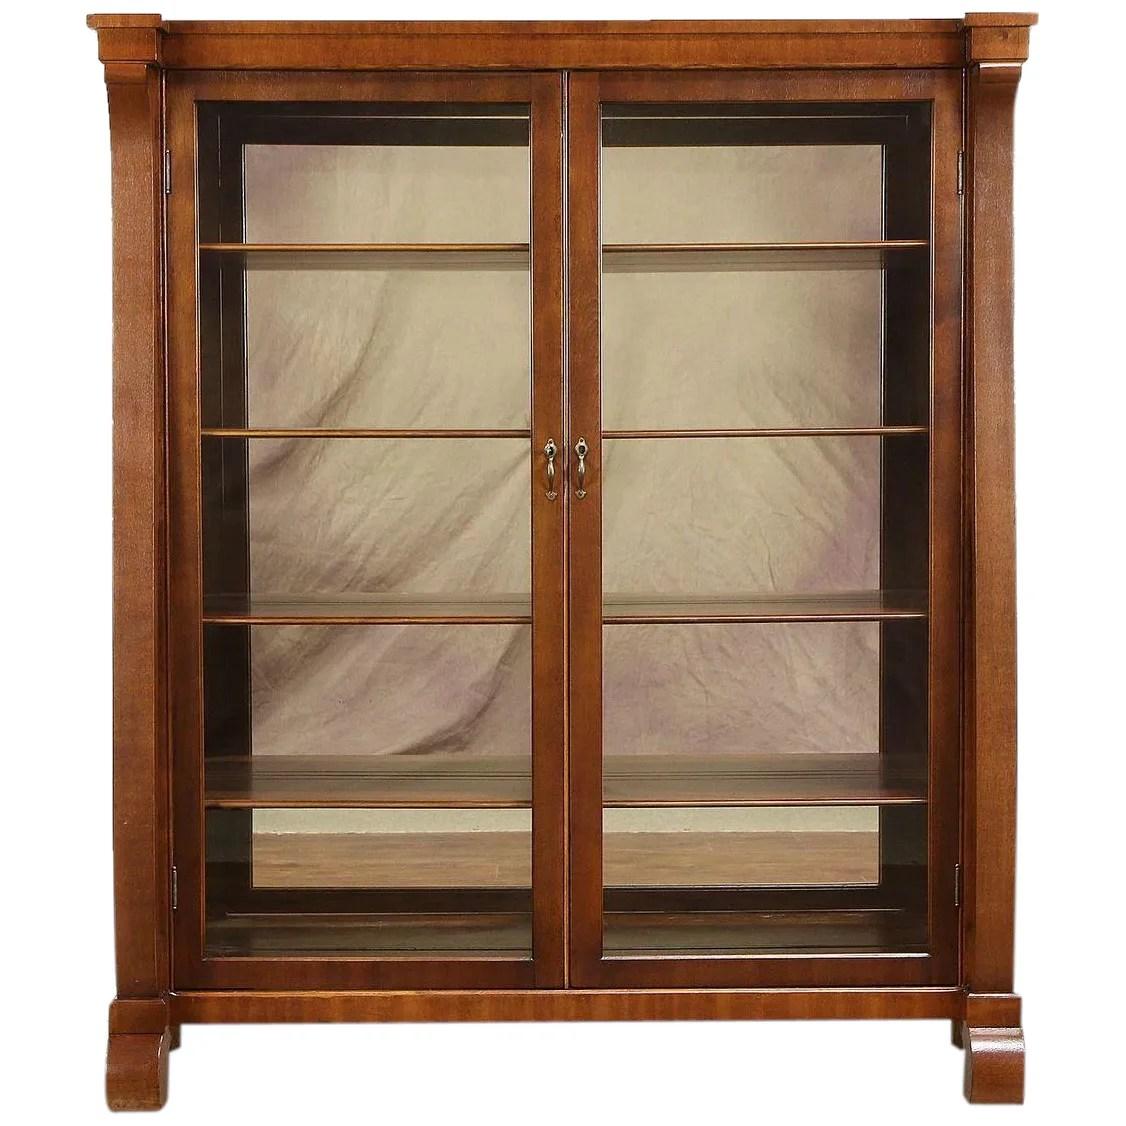 Empire Antique Mahogany Bookcase Or Curio Cabinet Glass Doors Mirrors 30921